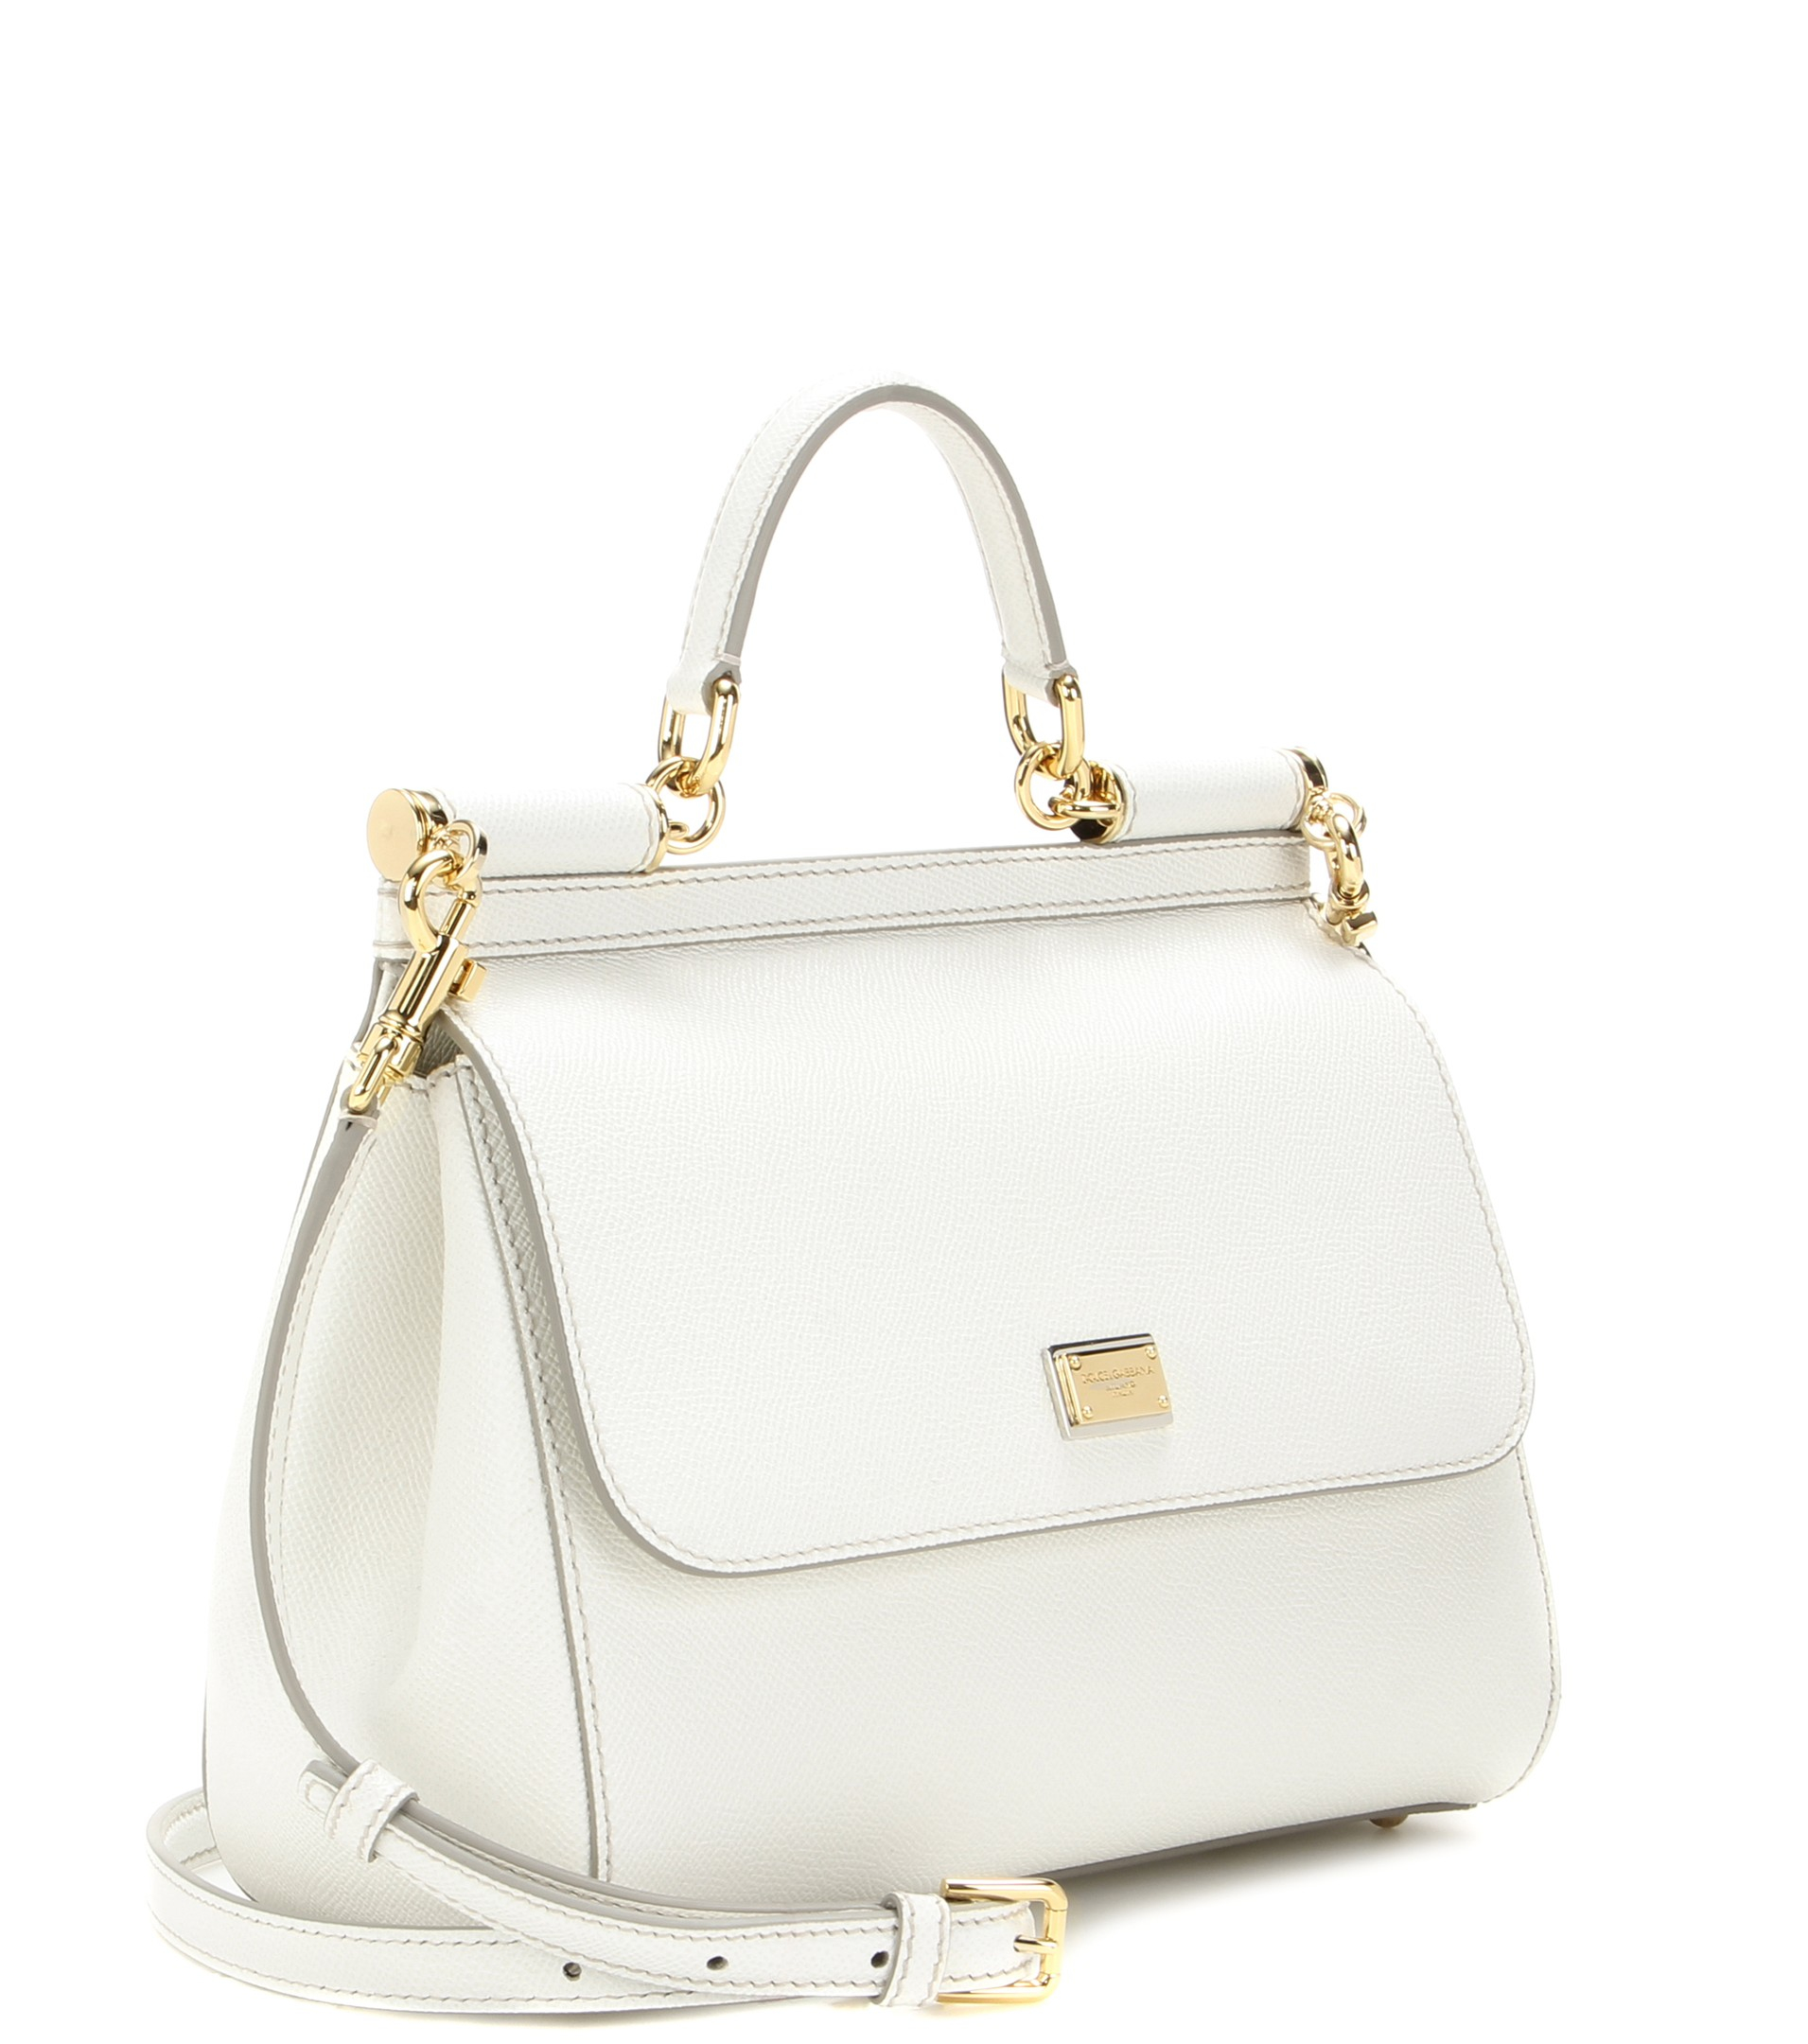 Lyst - Dolce   Gabbana Miss Sicily Medium Leather Shoulder Bag in White bb9562e030